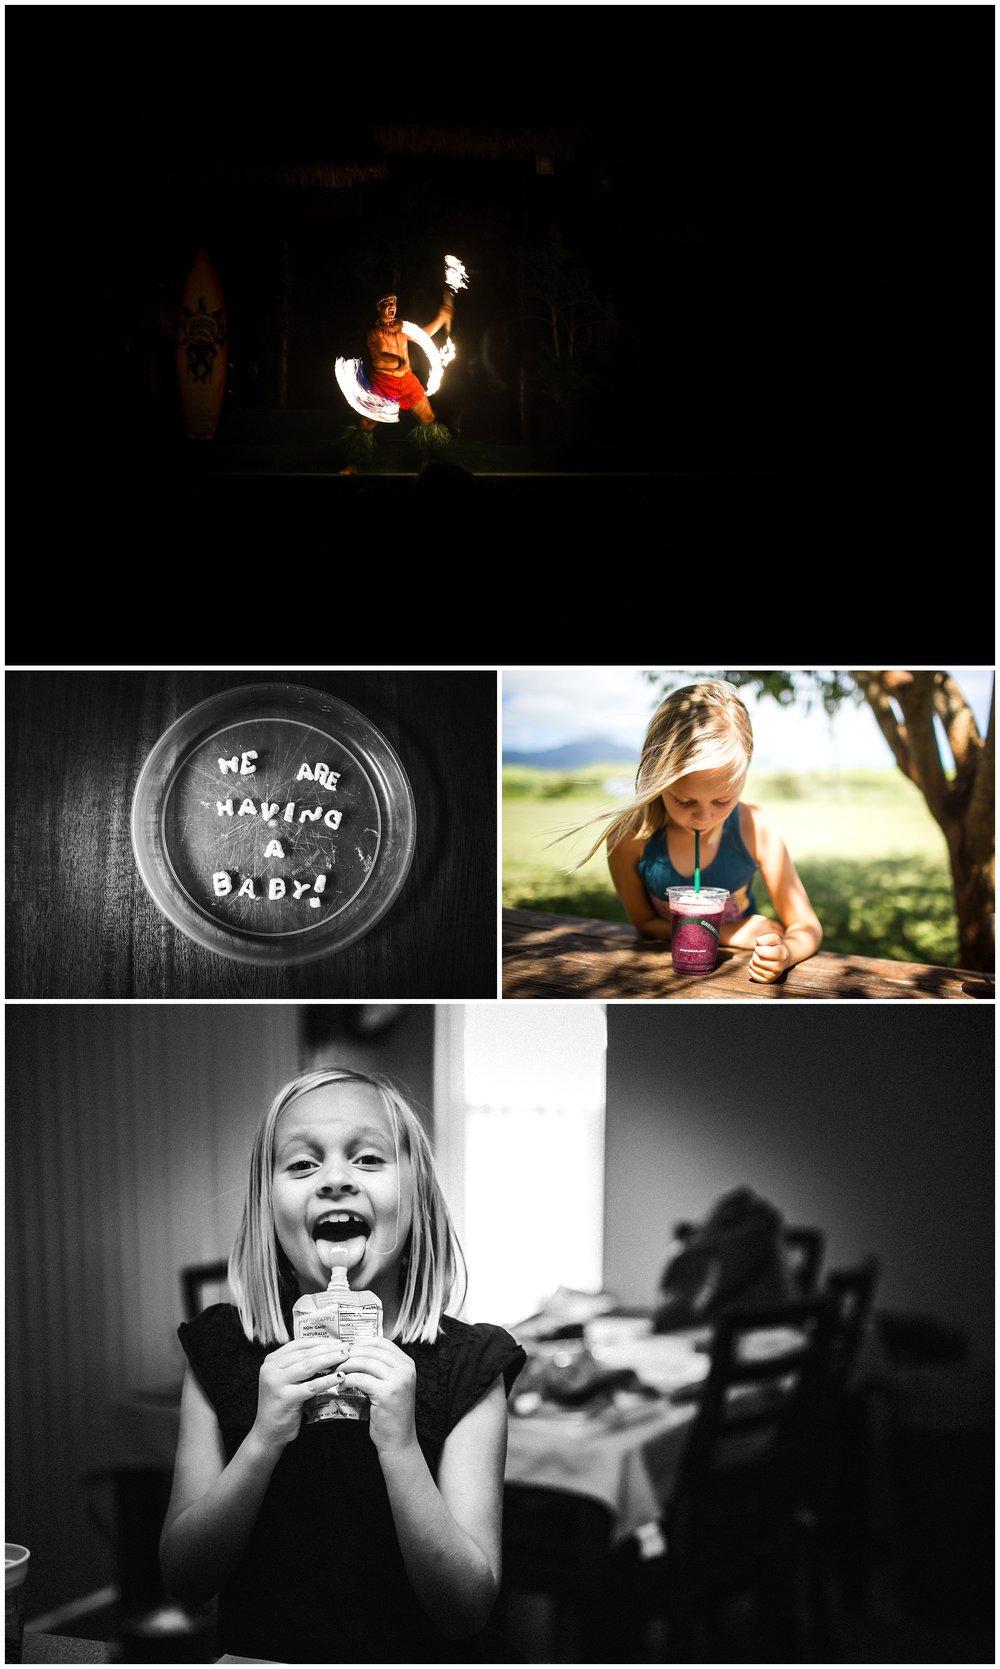 www.candicemphoto.com-_www.candicemphoto.com.jpg